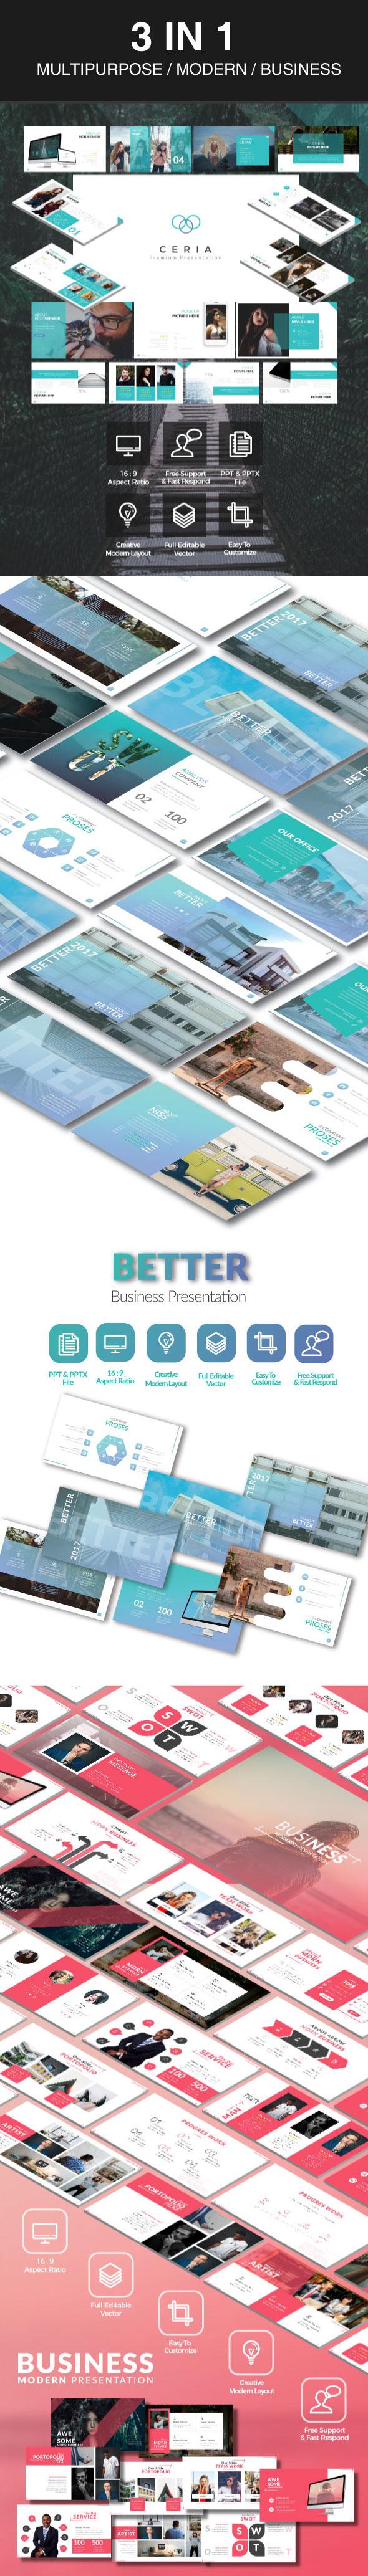 GraphicRiver Agustus Keynote Bundel 3 in 1 Multipurpose Template 20452621